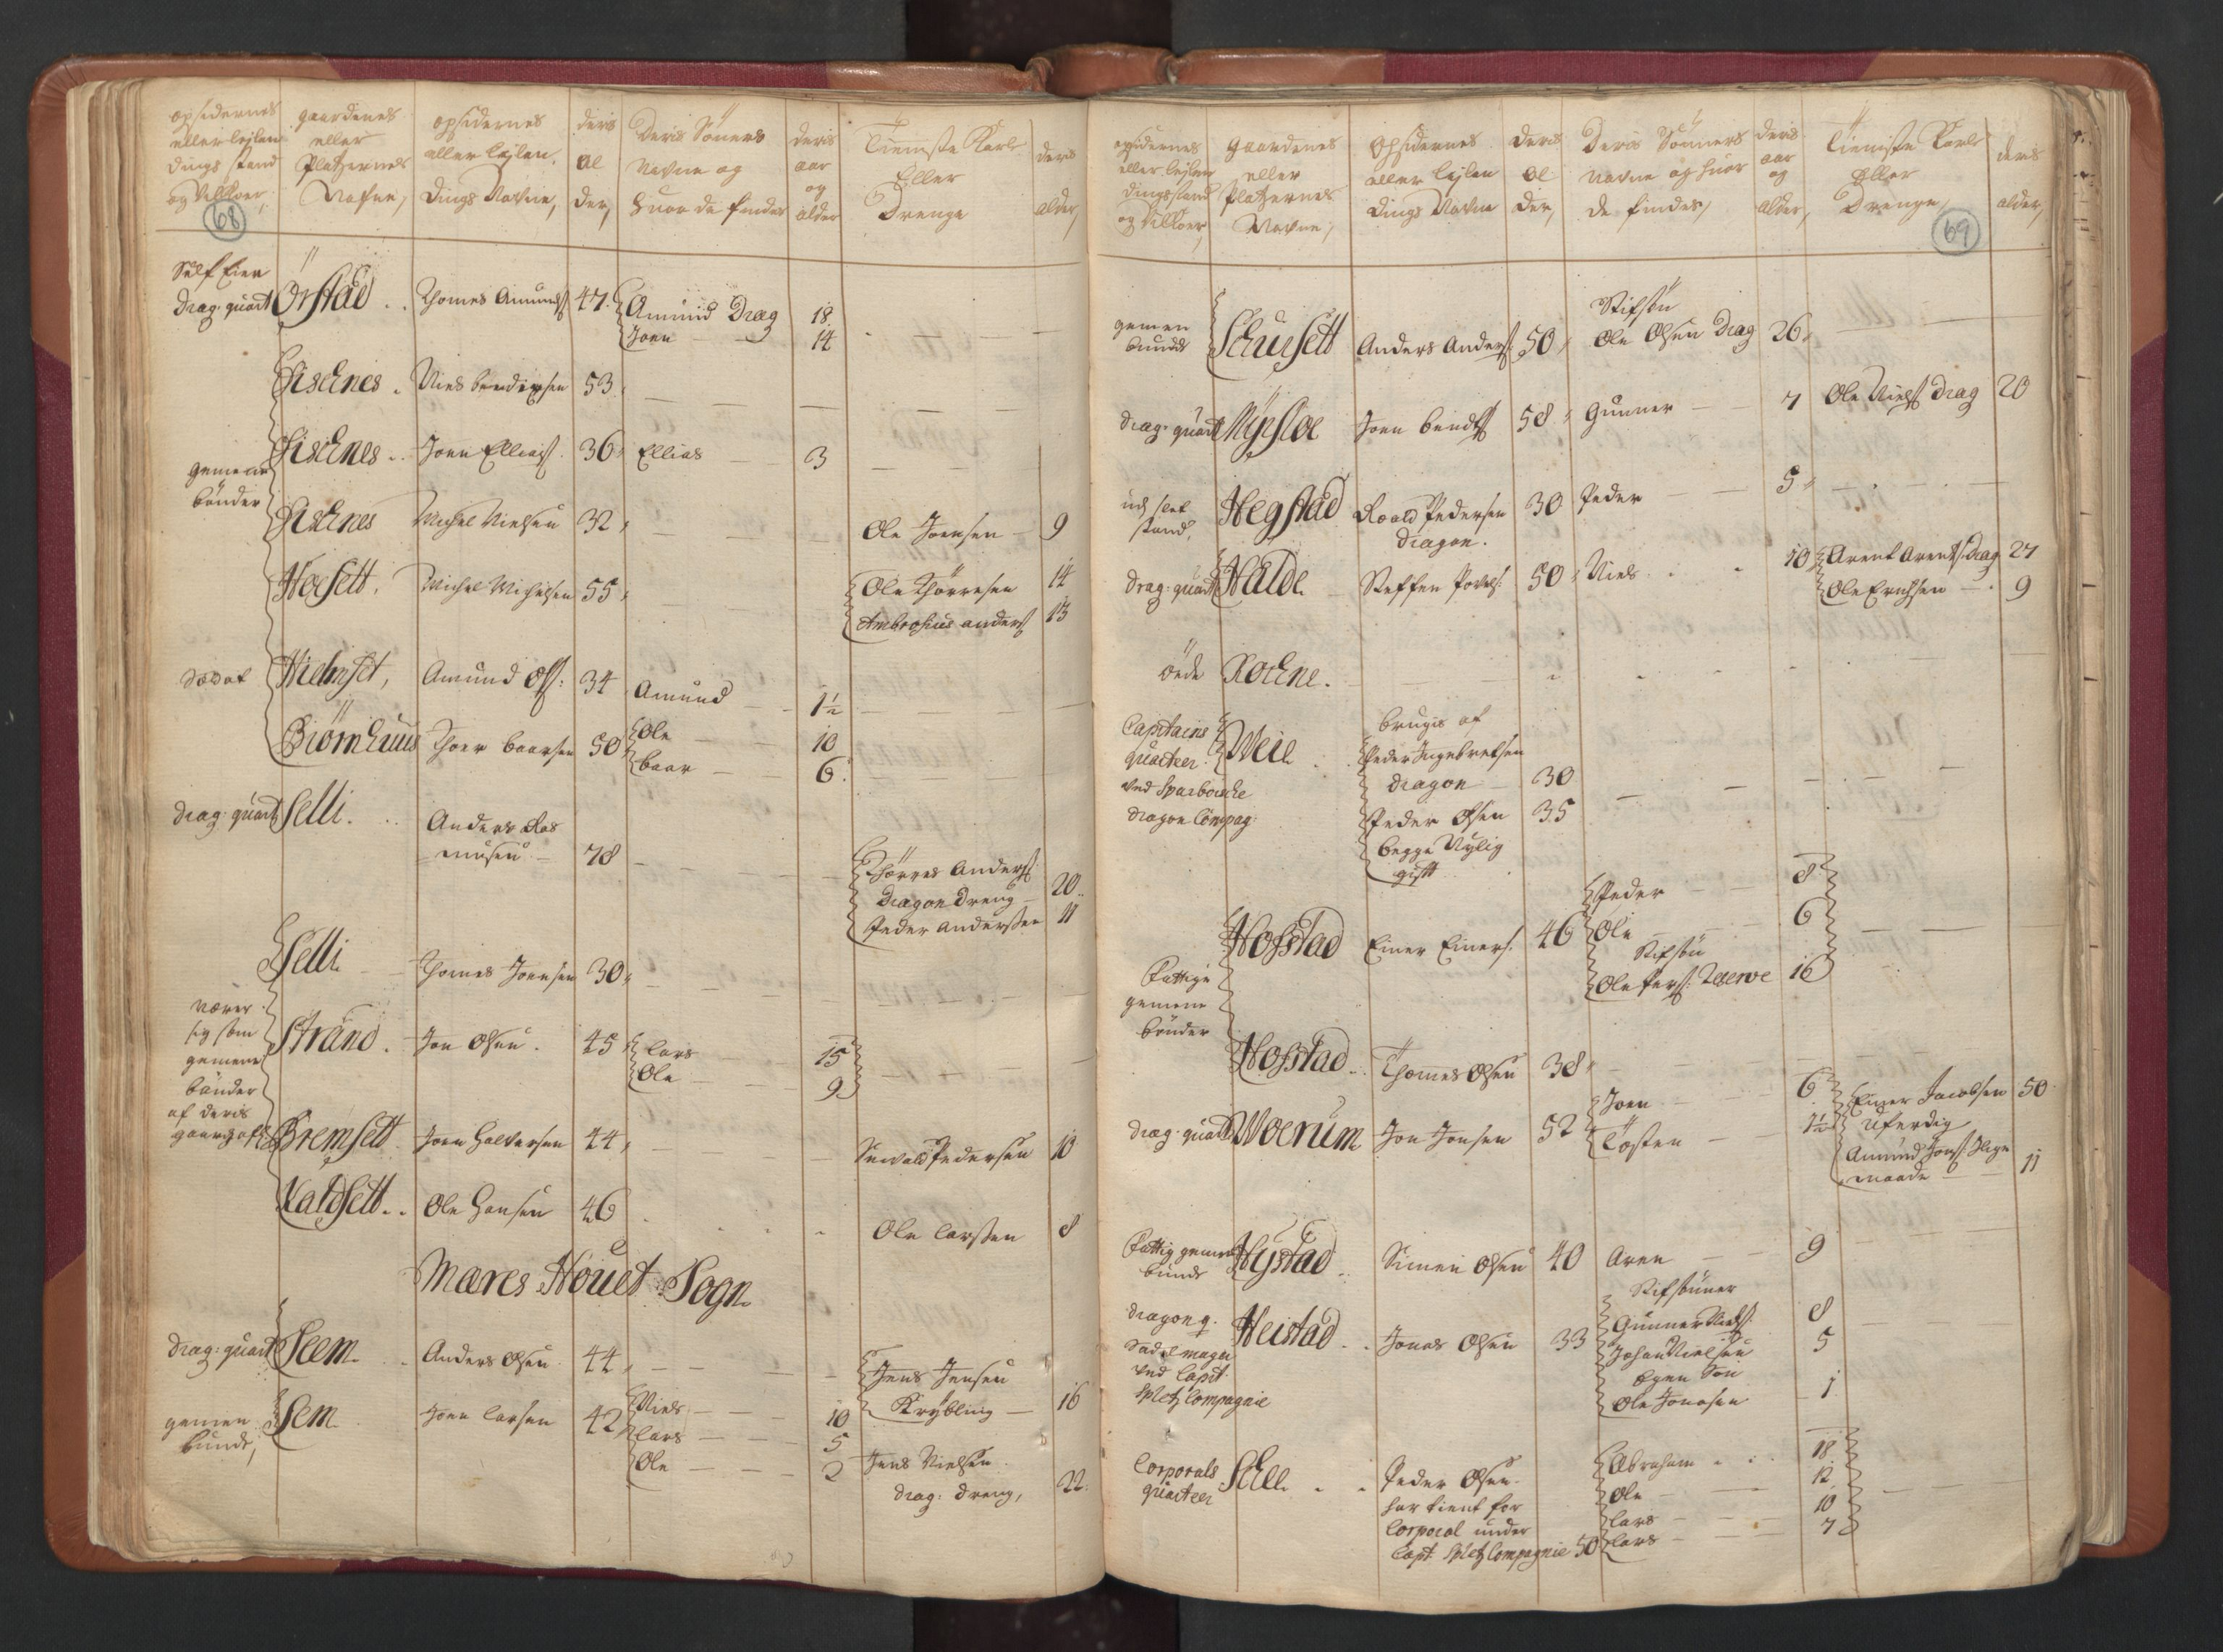 RA, Manntallet 1701, nr. 15: Inderøy fogderi og Namdal fogderi, 1701, s. 68-69